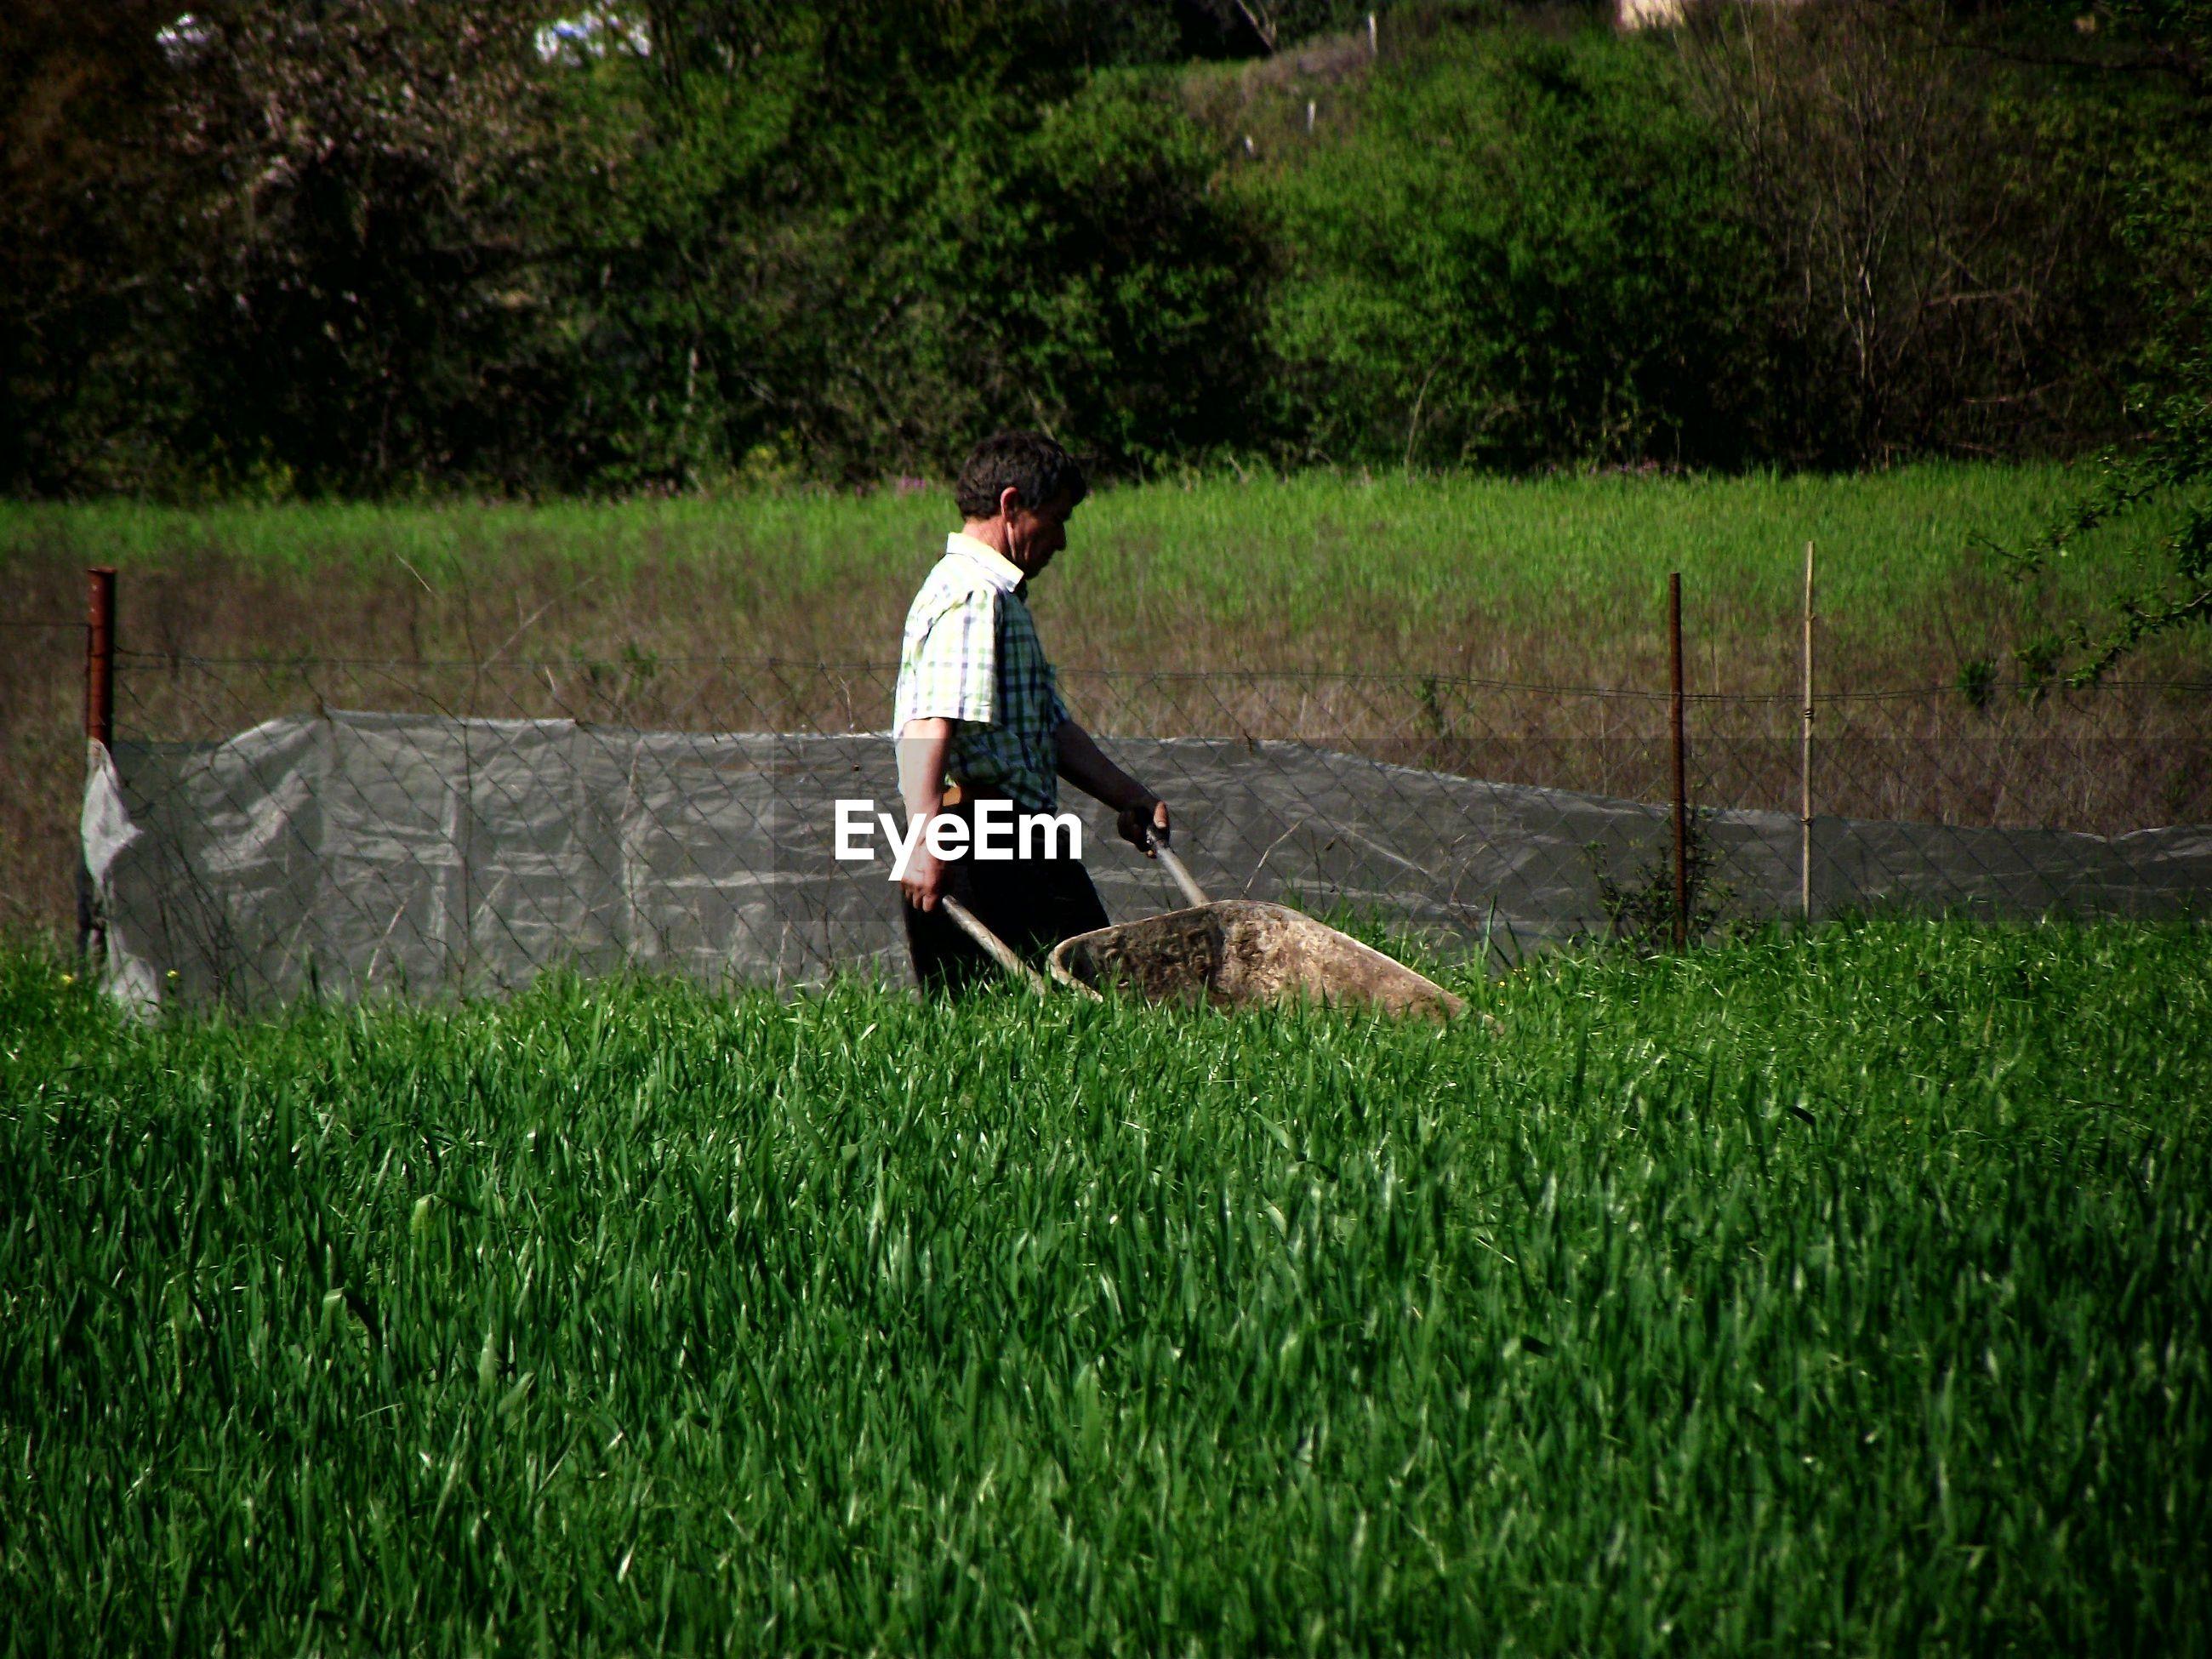 Farmer working amidst plants on field